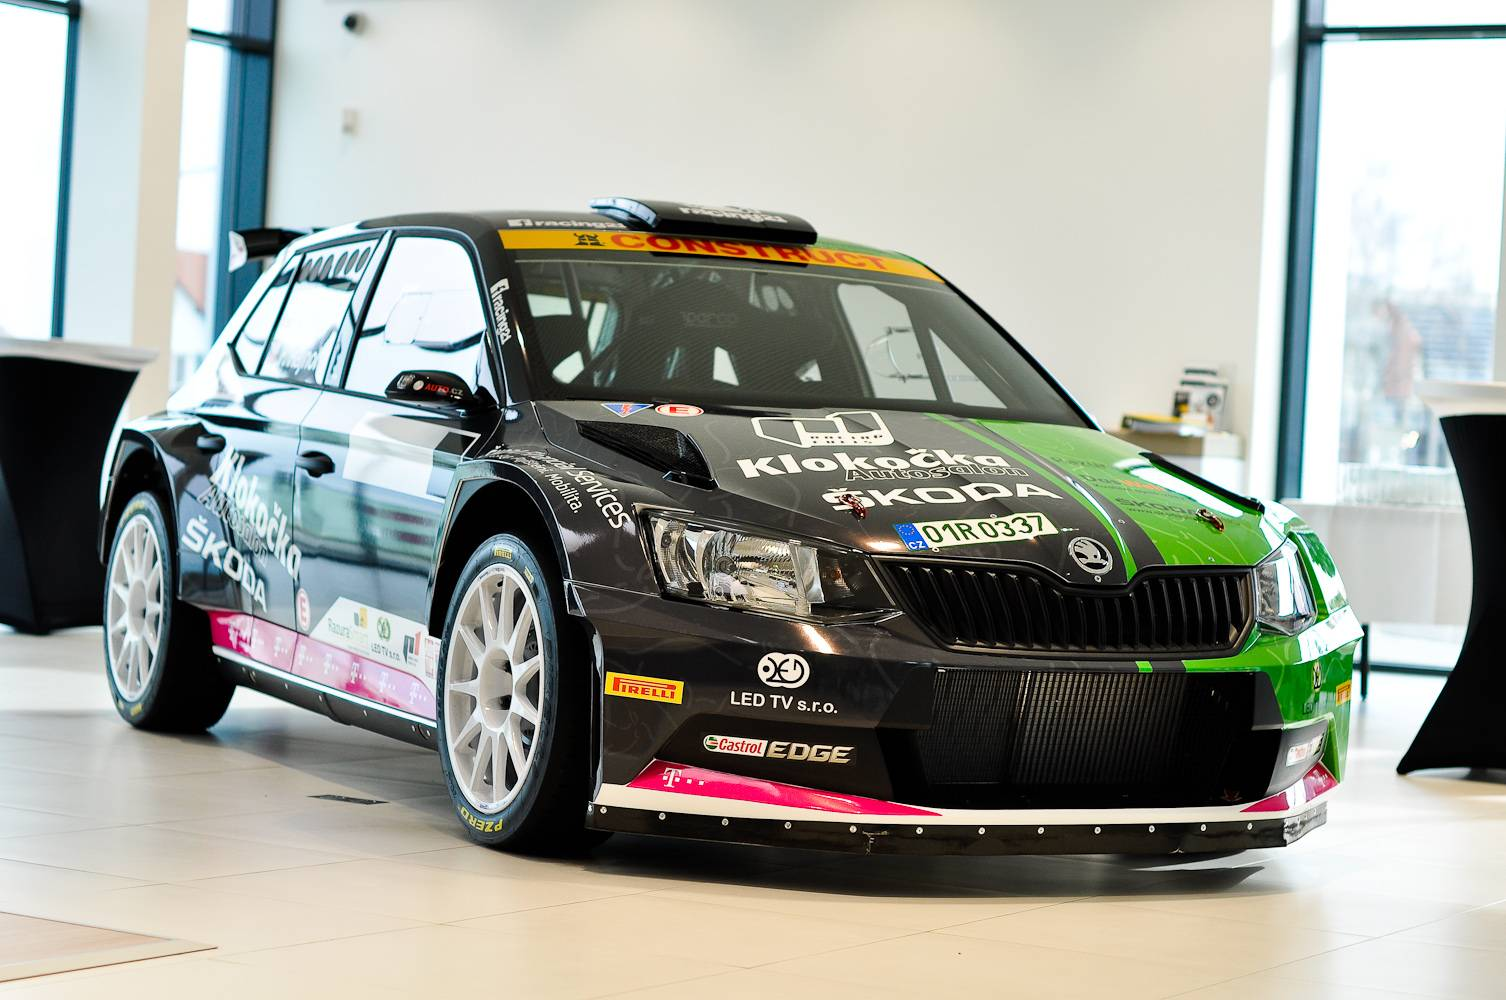 Vojtech-Stajf-Skoda-Fabia-R5-Racing-21-01